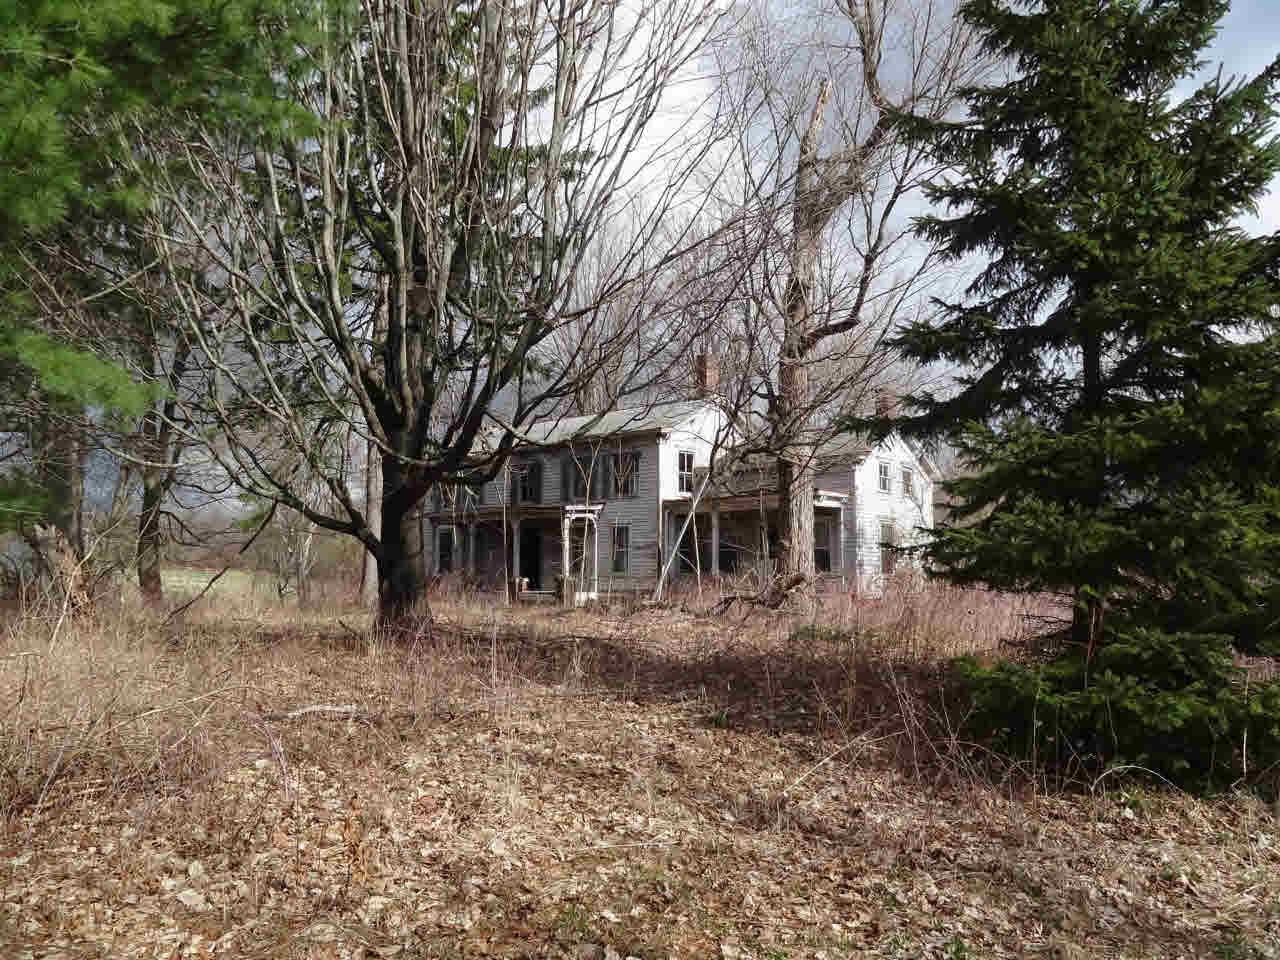 907 LIVINGSTON CHURCH RD, Taghkanic, NY 12523